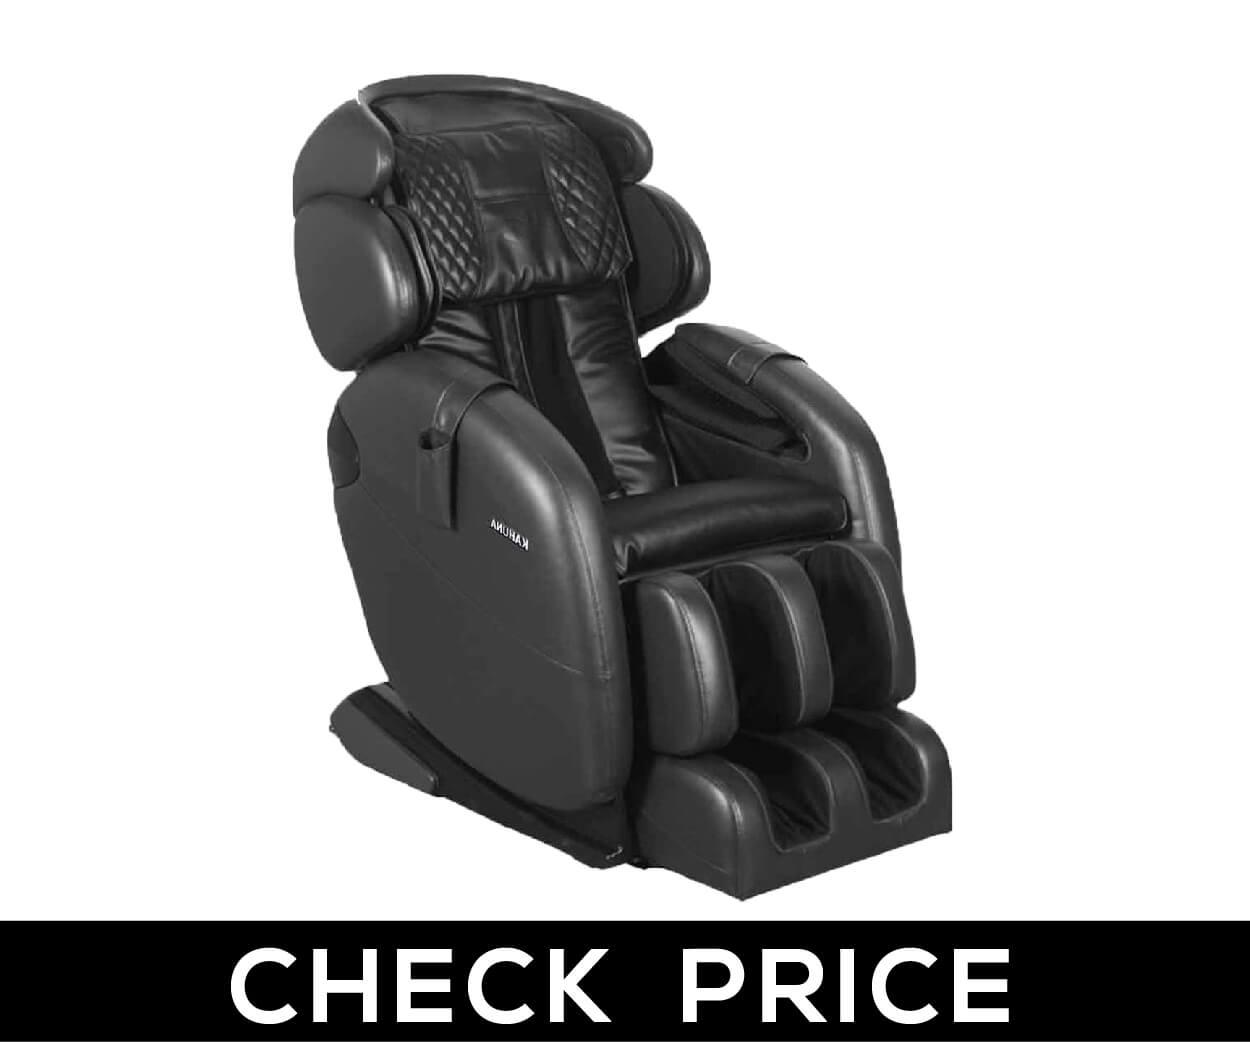 Kahuna LM 6800s Massage Chairs